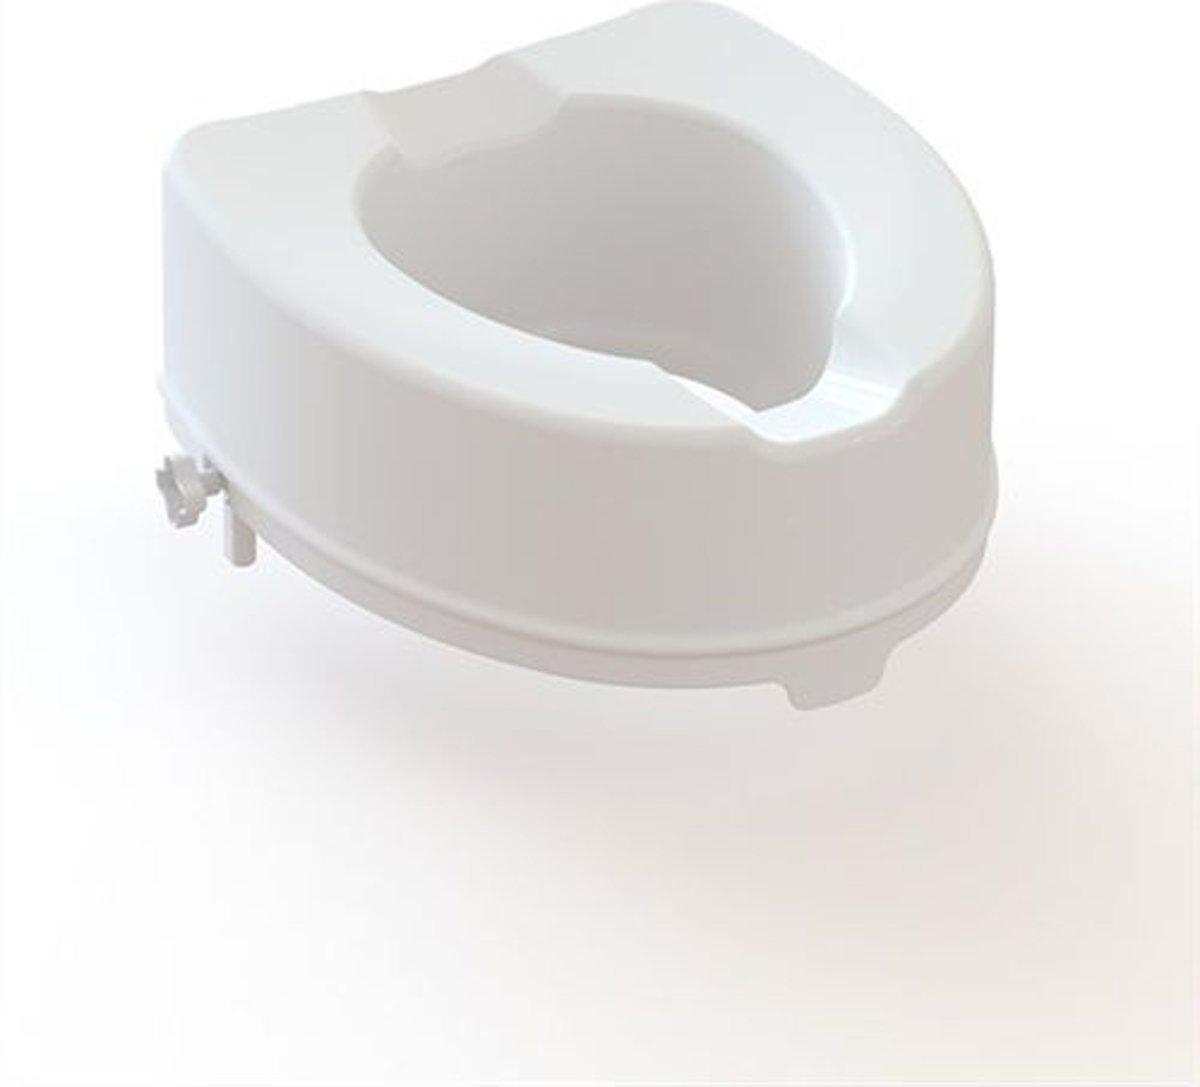 Ares Toiletverhoger 10 cm